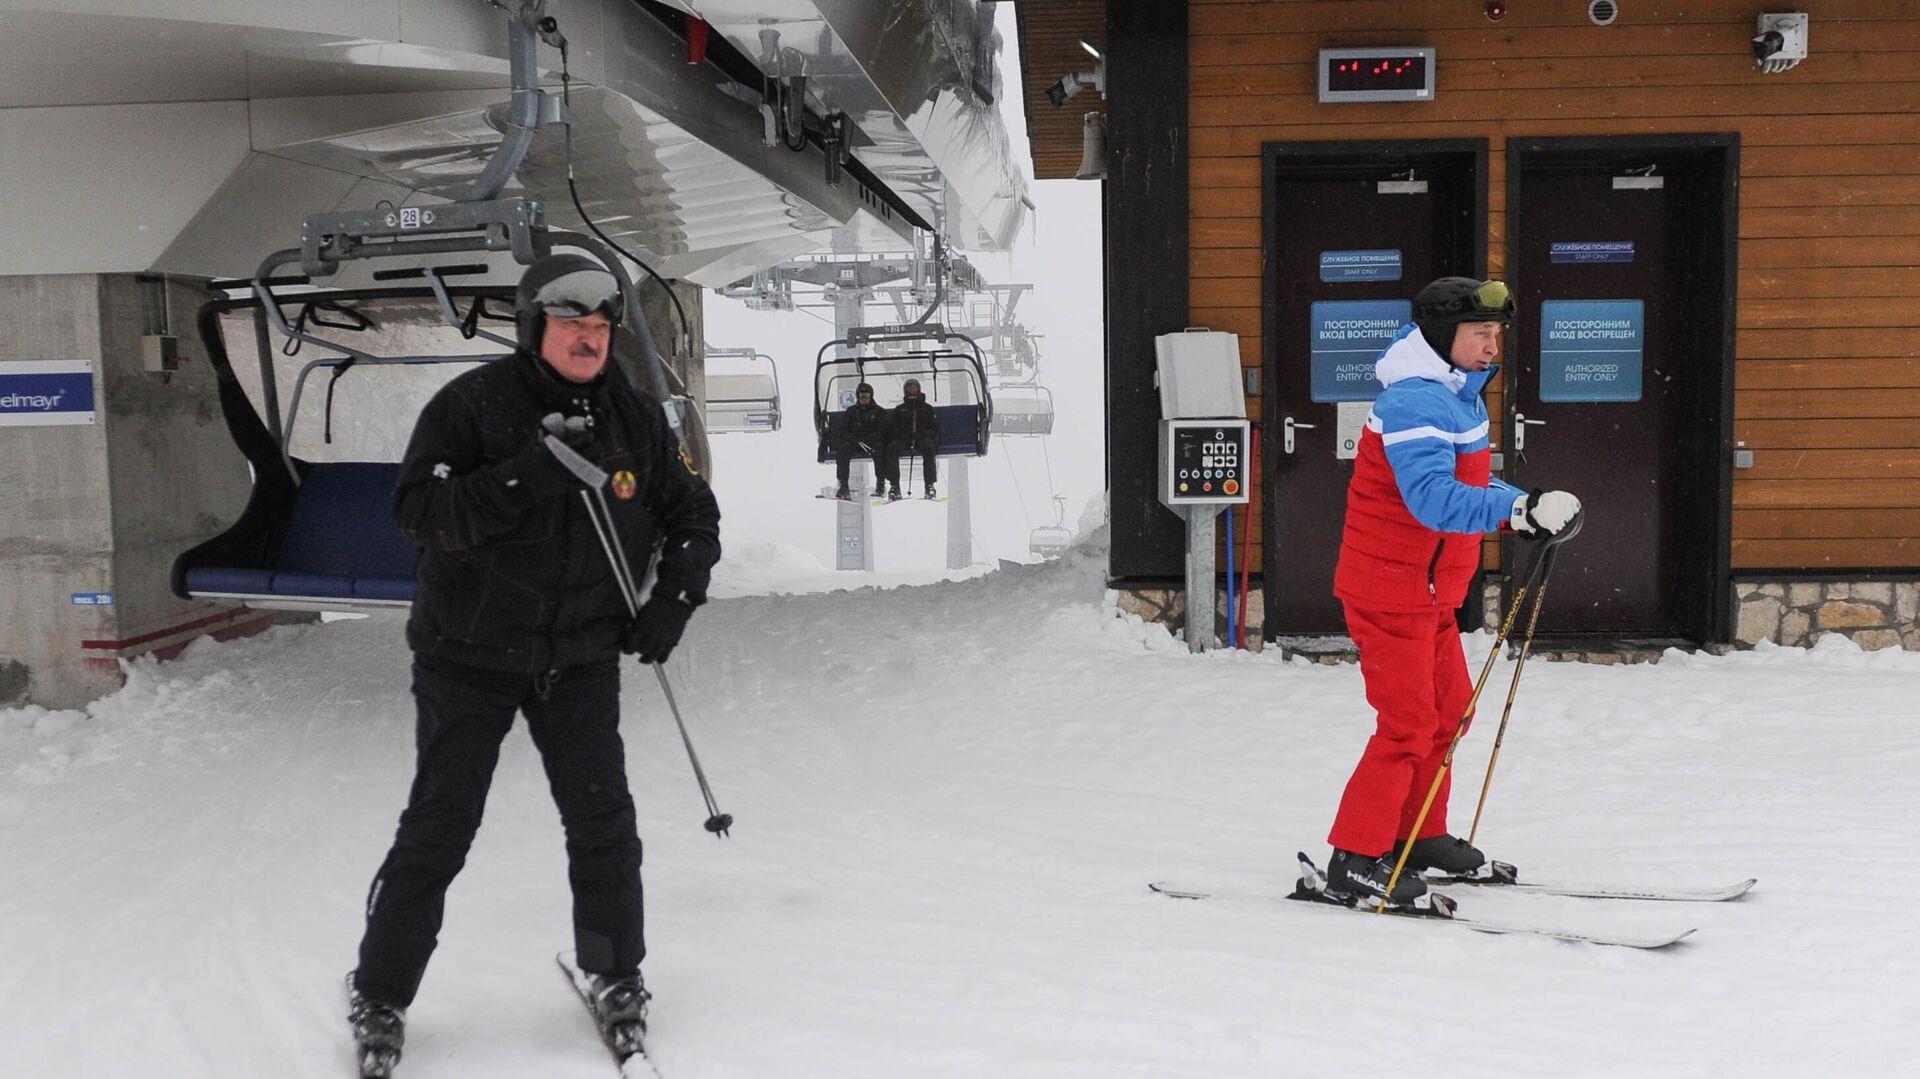 Президент РФ Владимир Путин и президент Белоруссии Александр Лукашенко во время катания на лыжах - РИА Новости, 1920, 22.02.2021